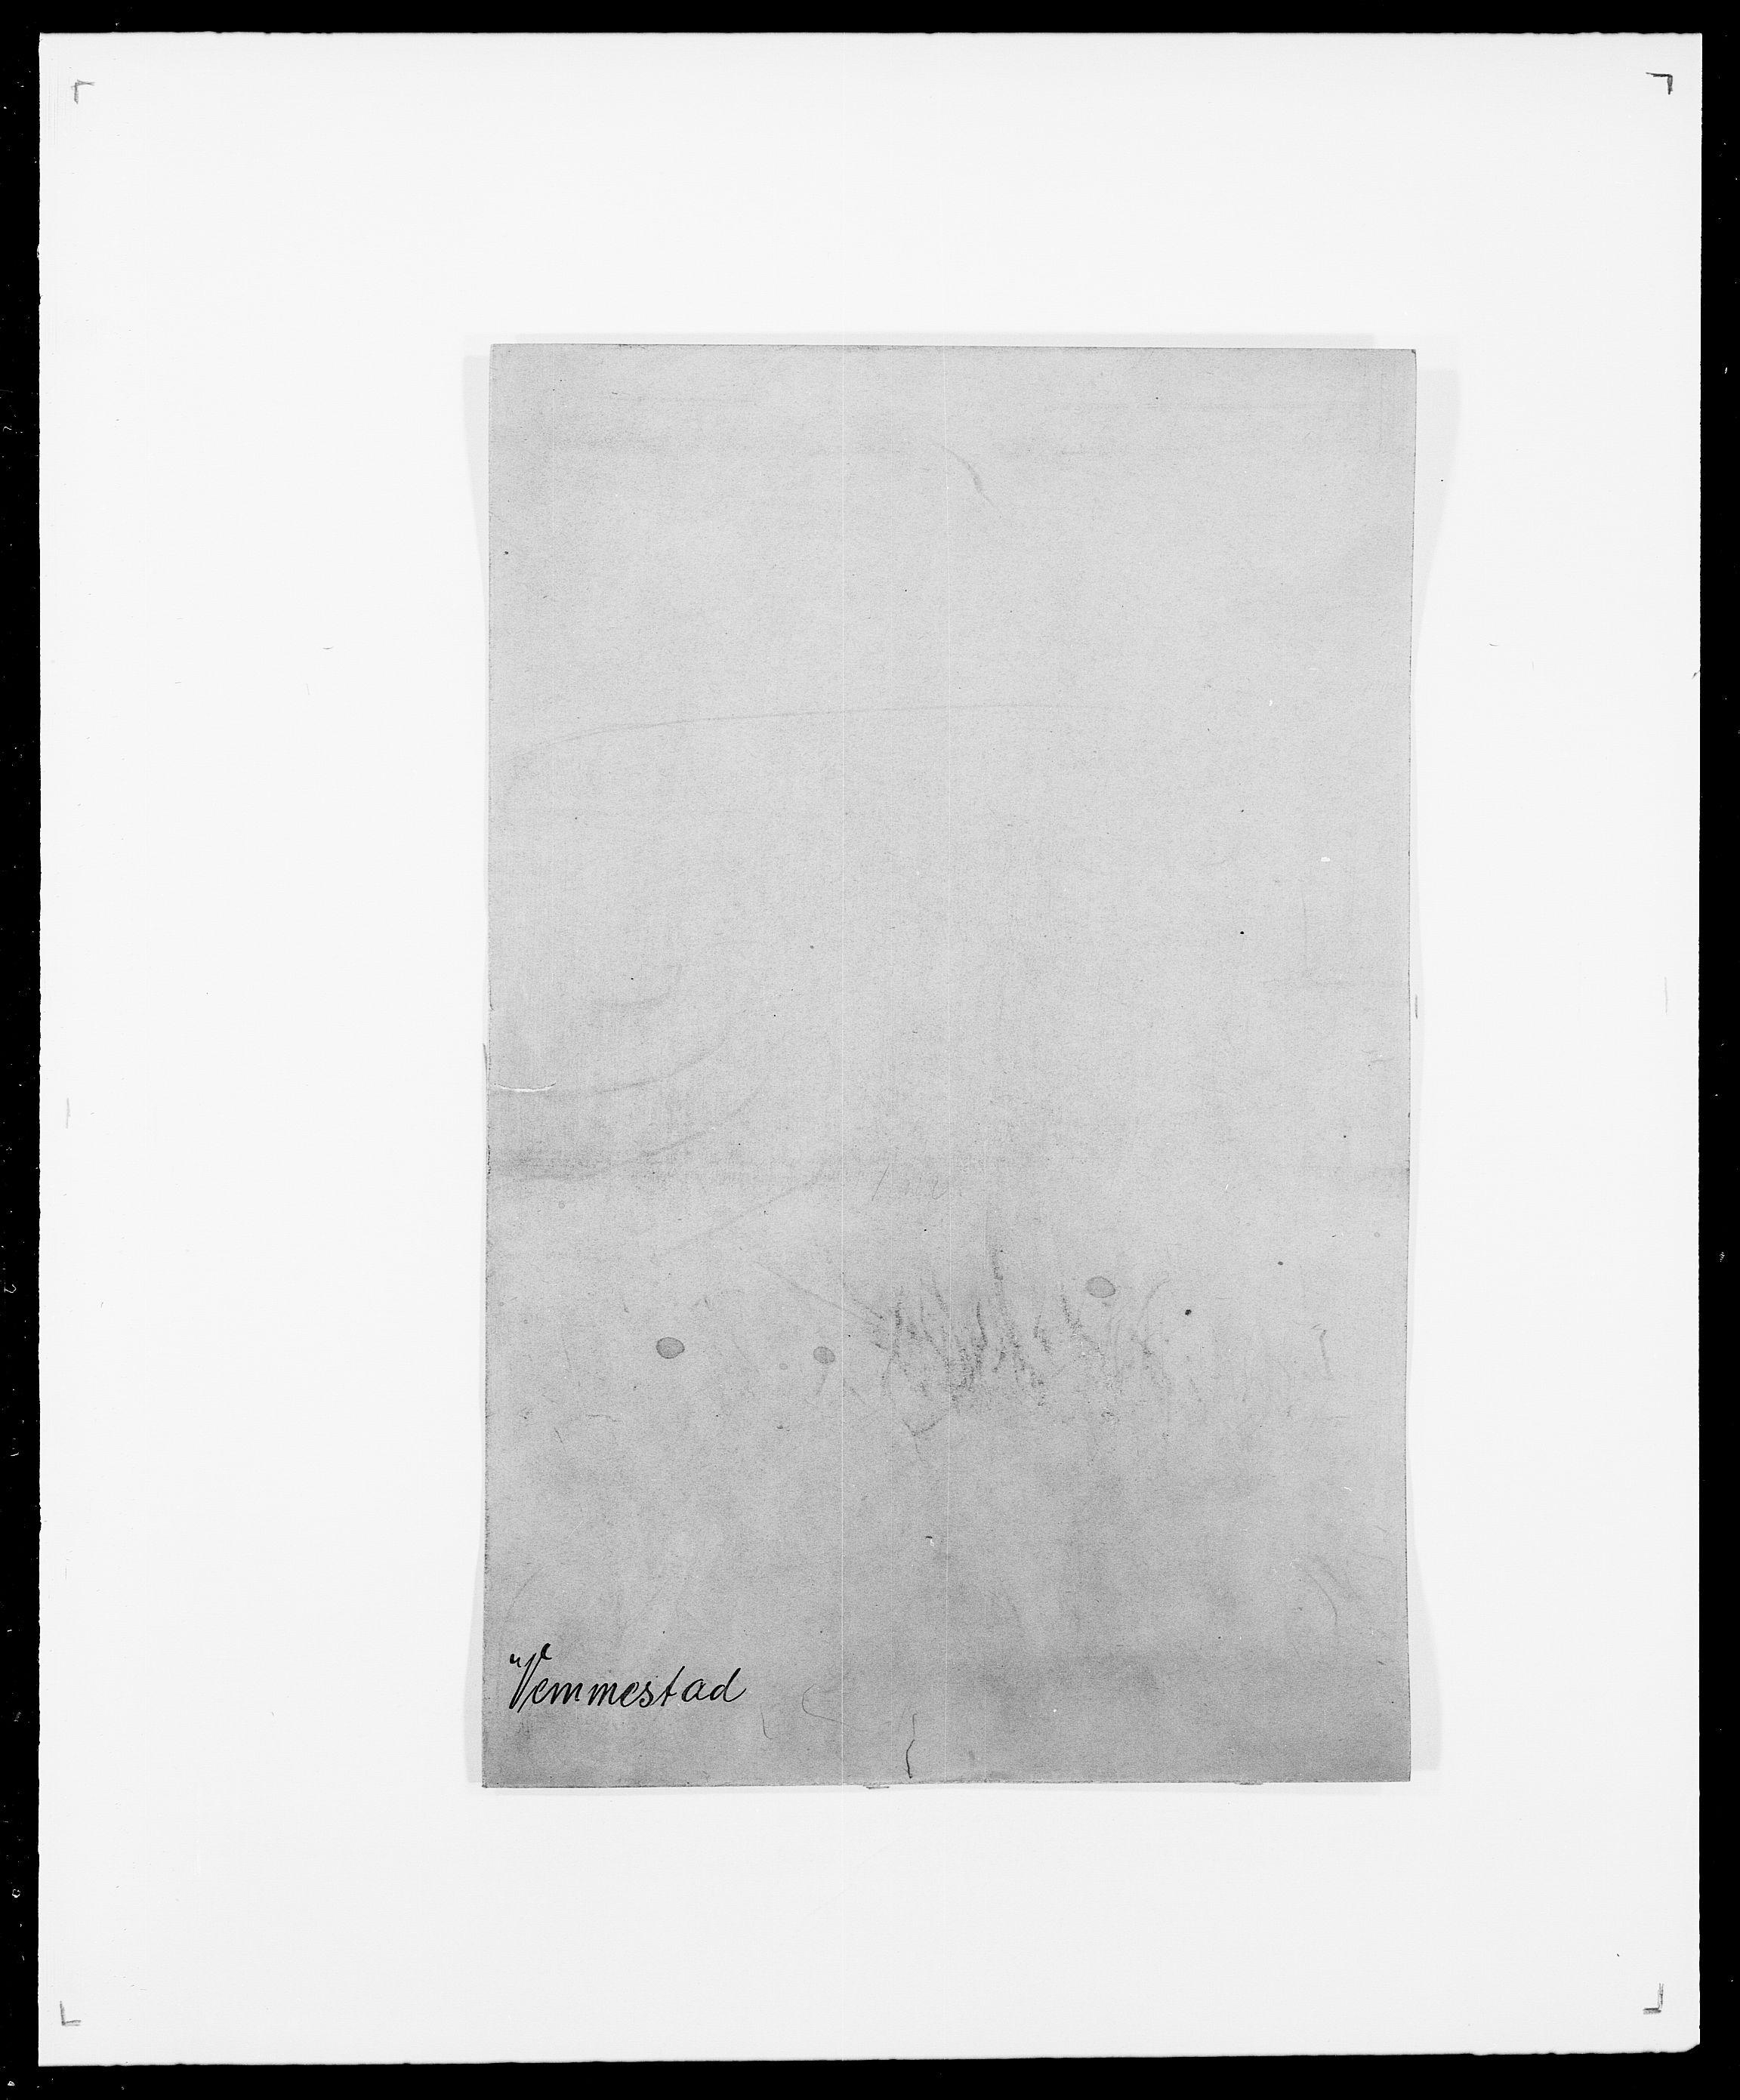 SAO, Delgobe, Charles Antoine - samling, D/Da/L0041: Vemmestad - Viker, s. 1